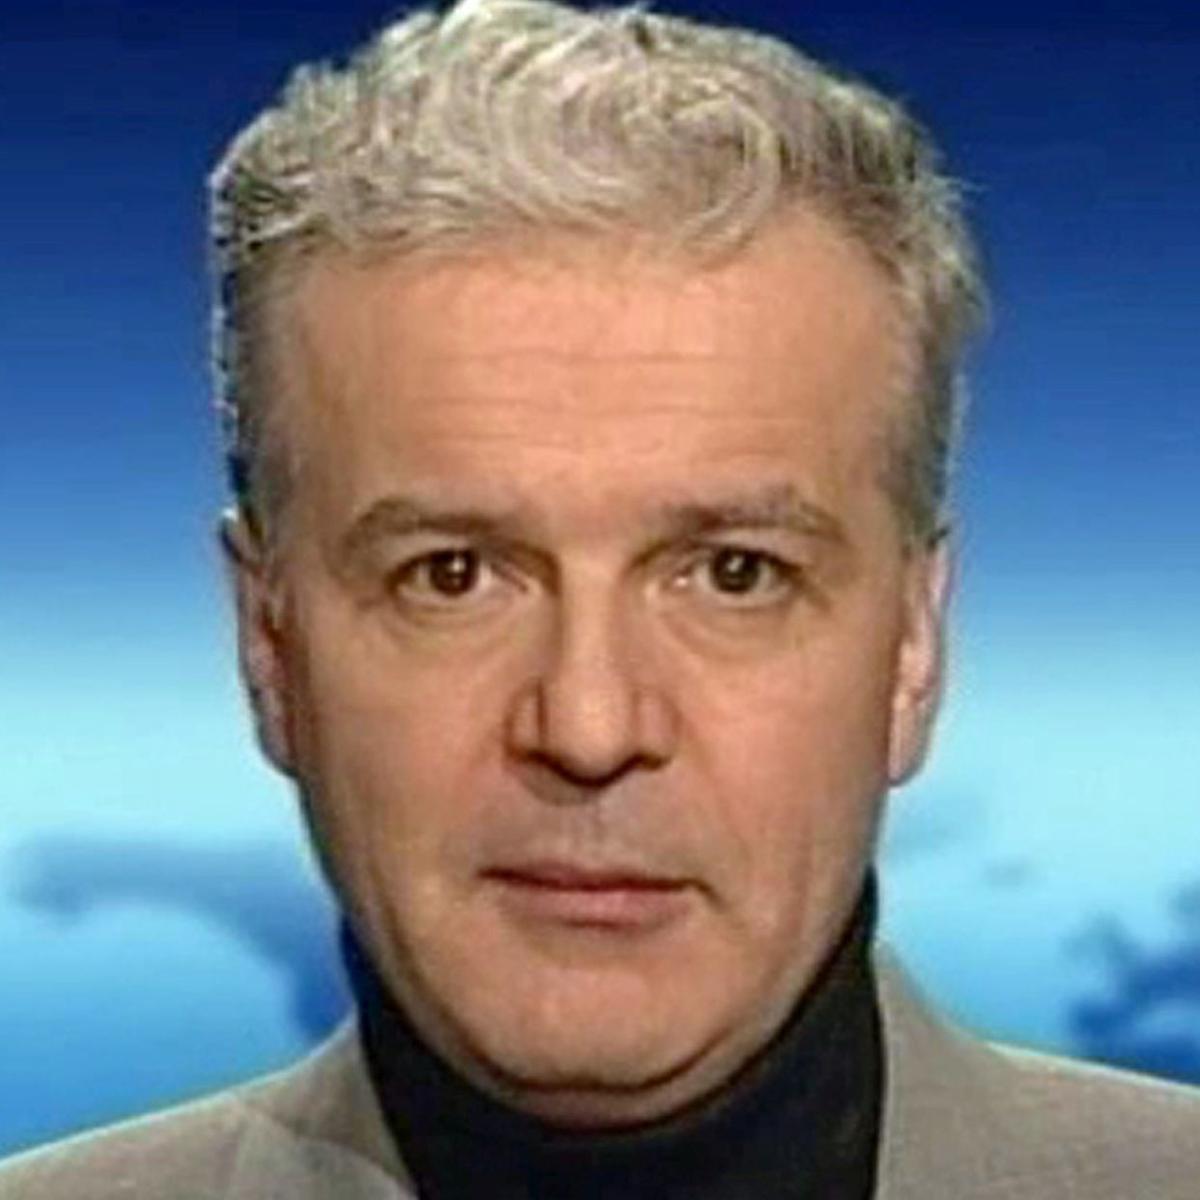 Jürgen Seitz